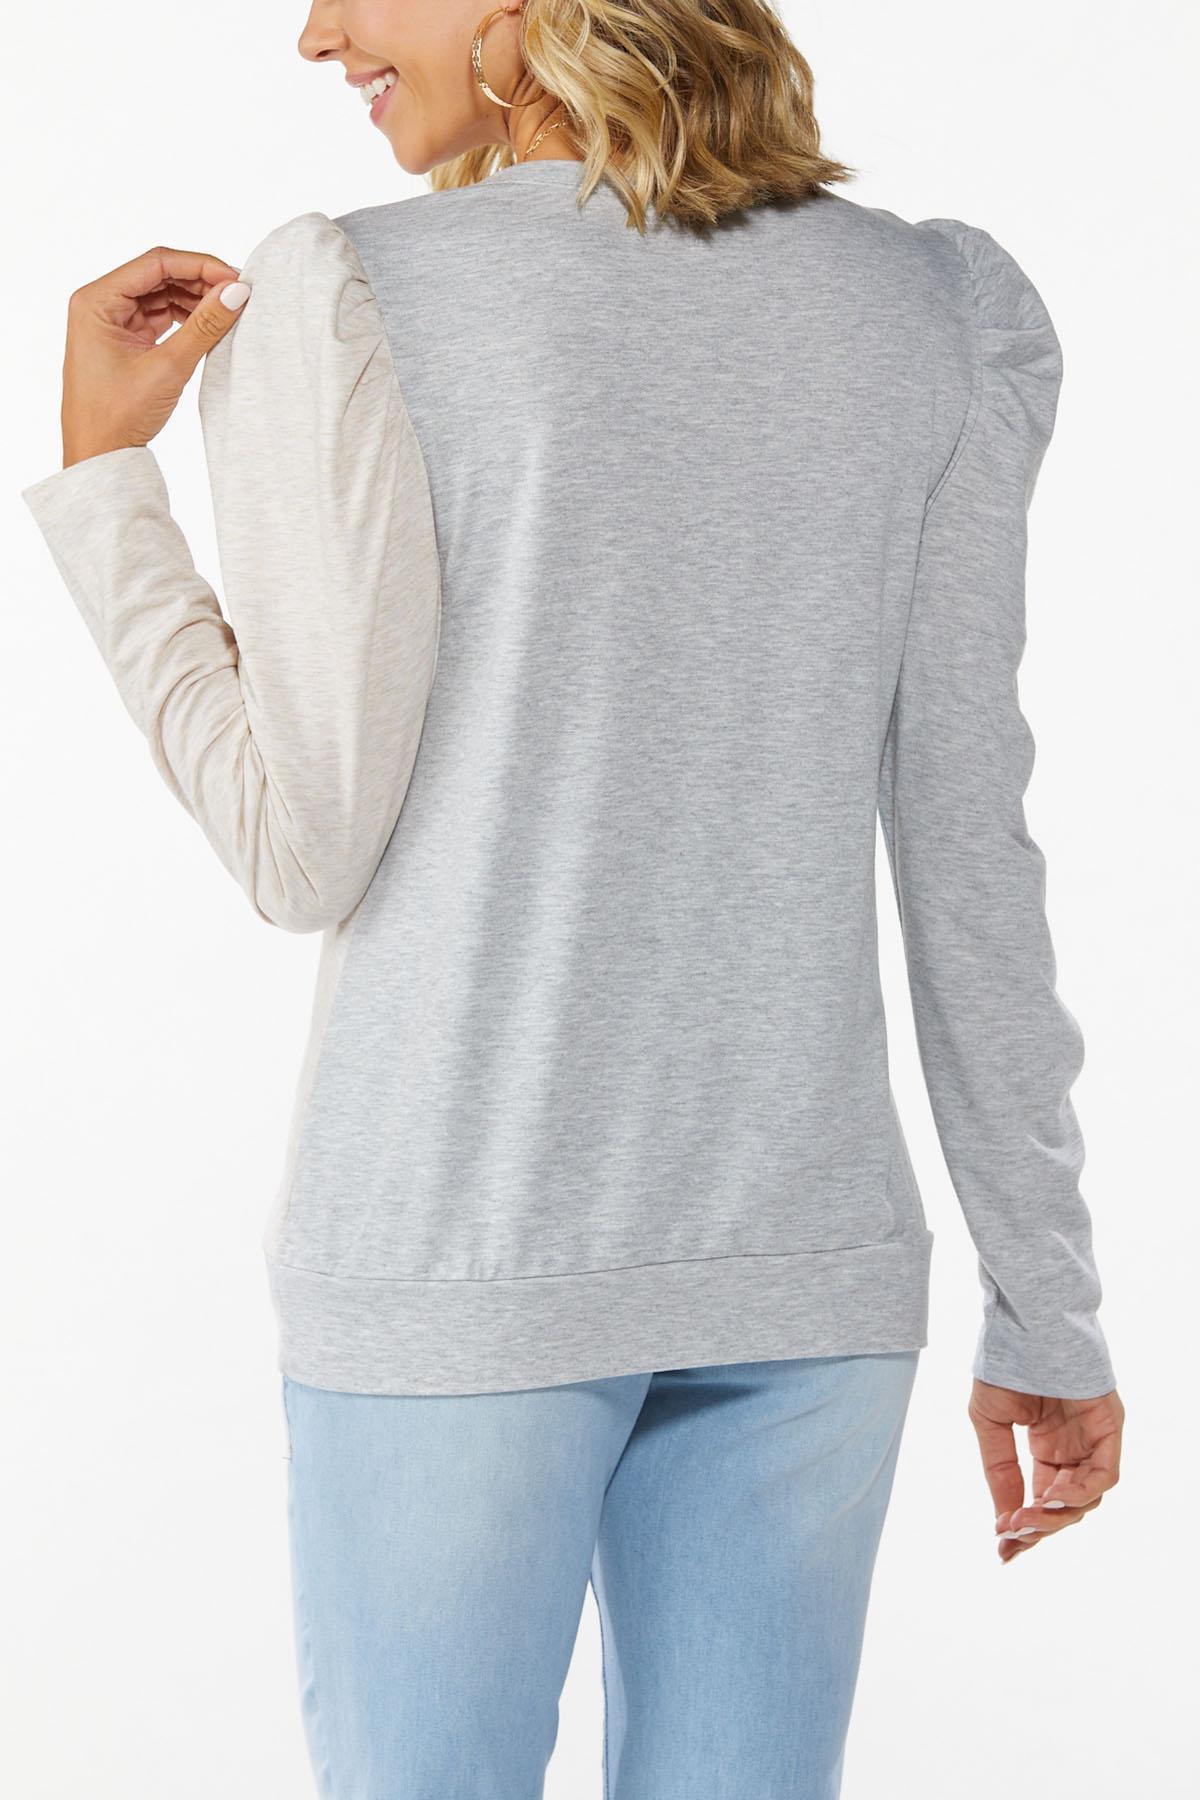 Plus Size Colorblock Puff Sleeve Top (Item #44780888)